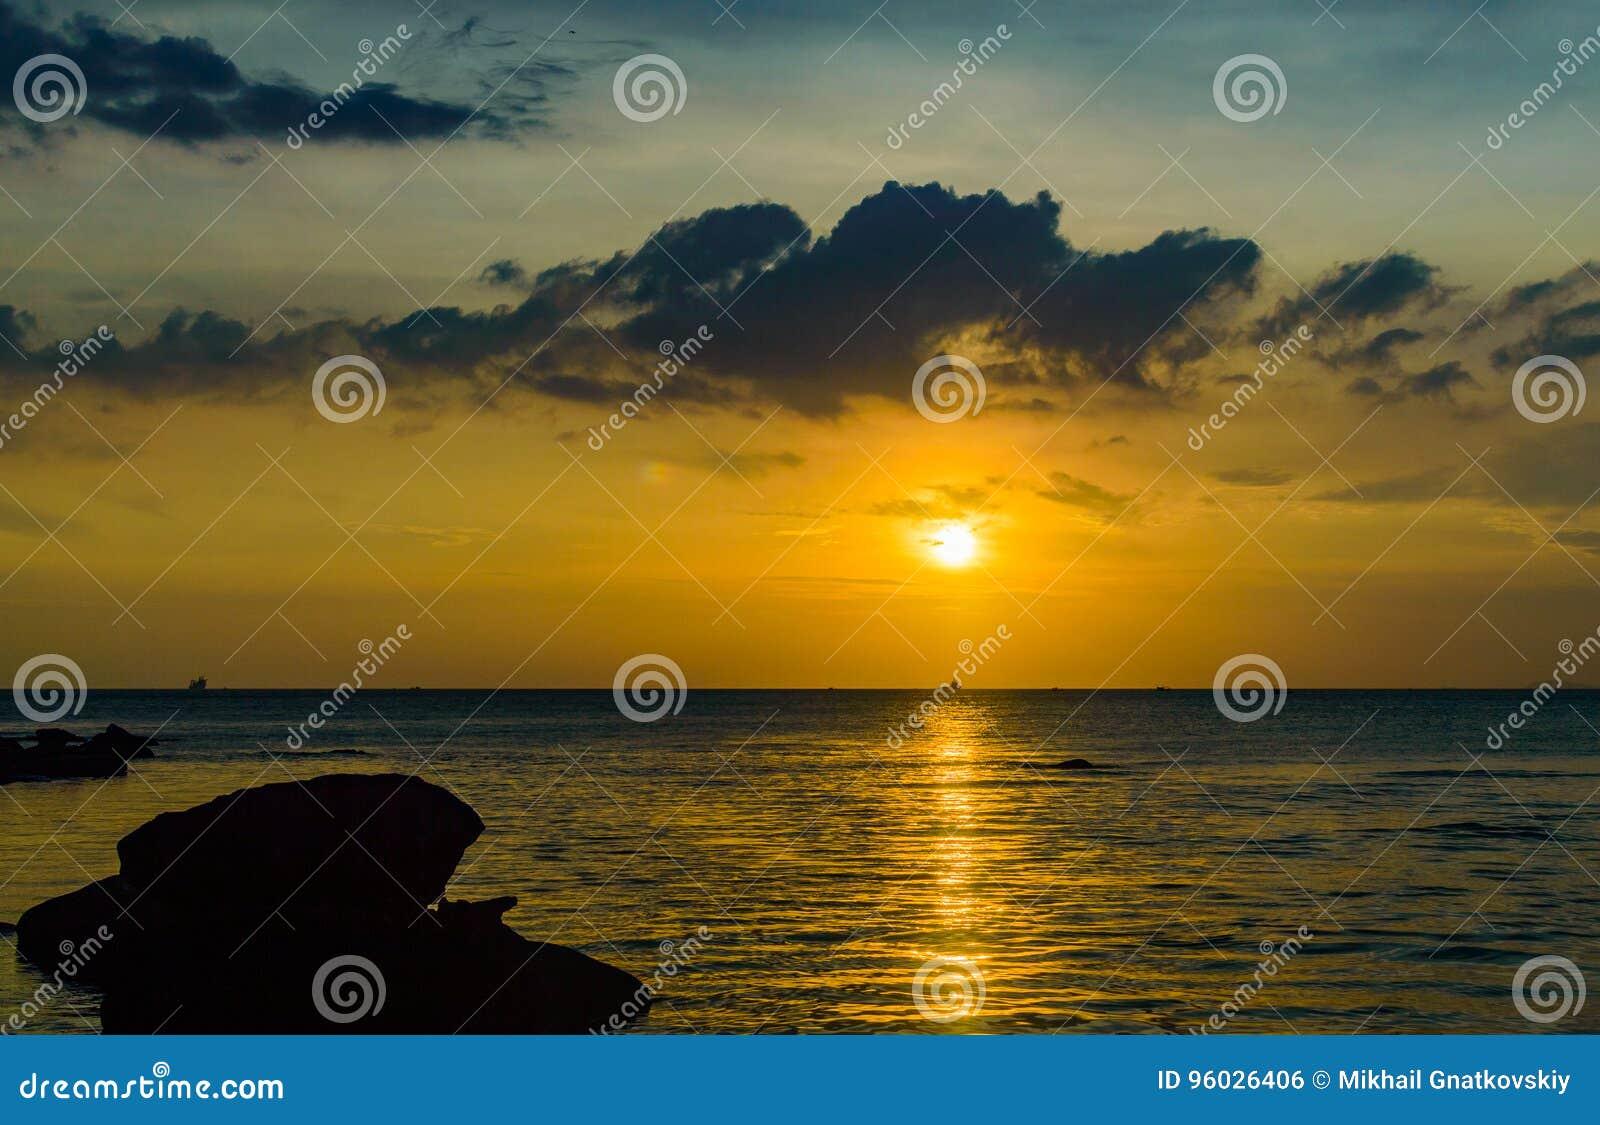 Złoty zmierzch nad morzem, Sihanoukville, Kambodża